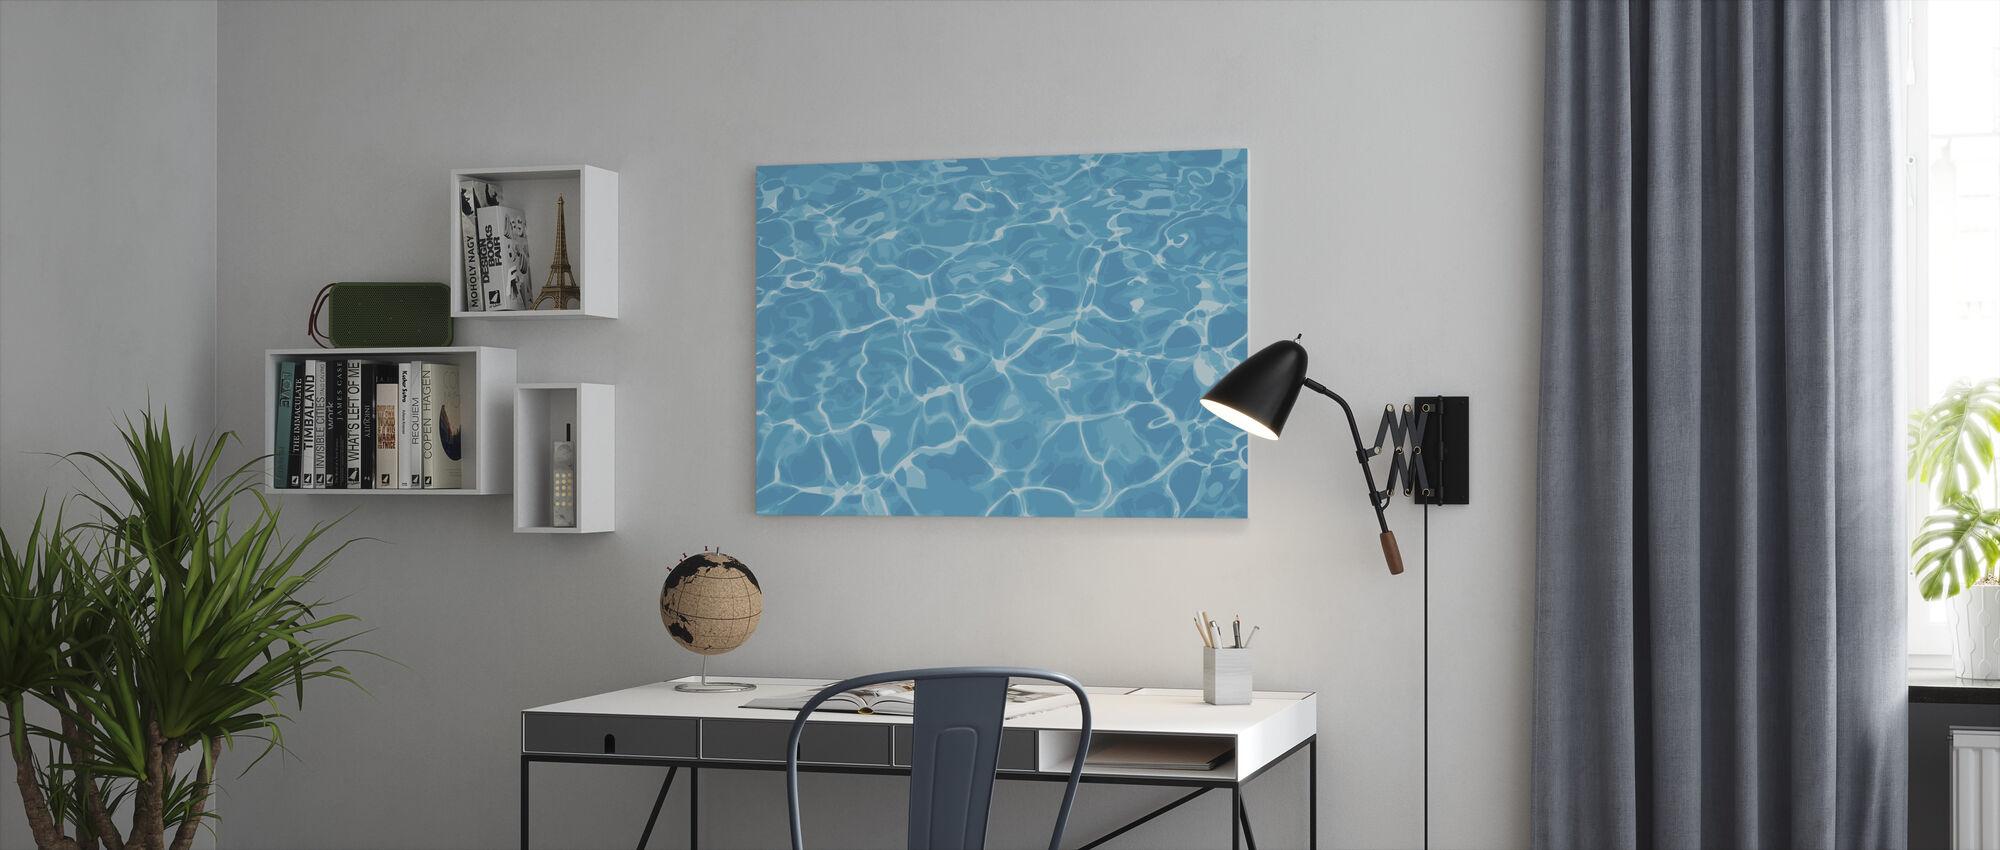 Reflektion i vatten - Canvastavla - Kontor